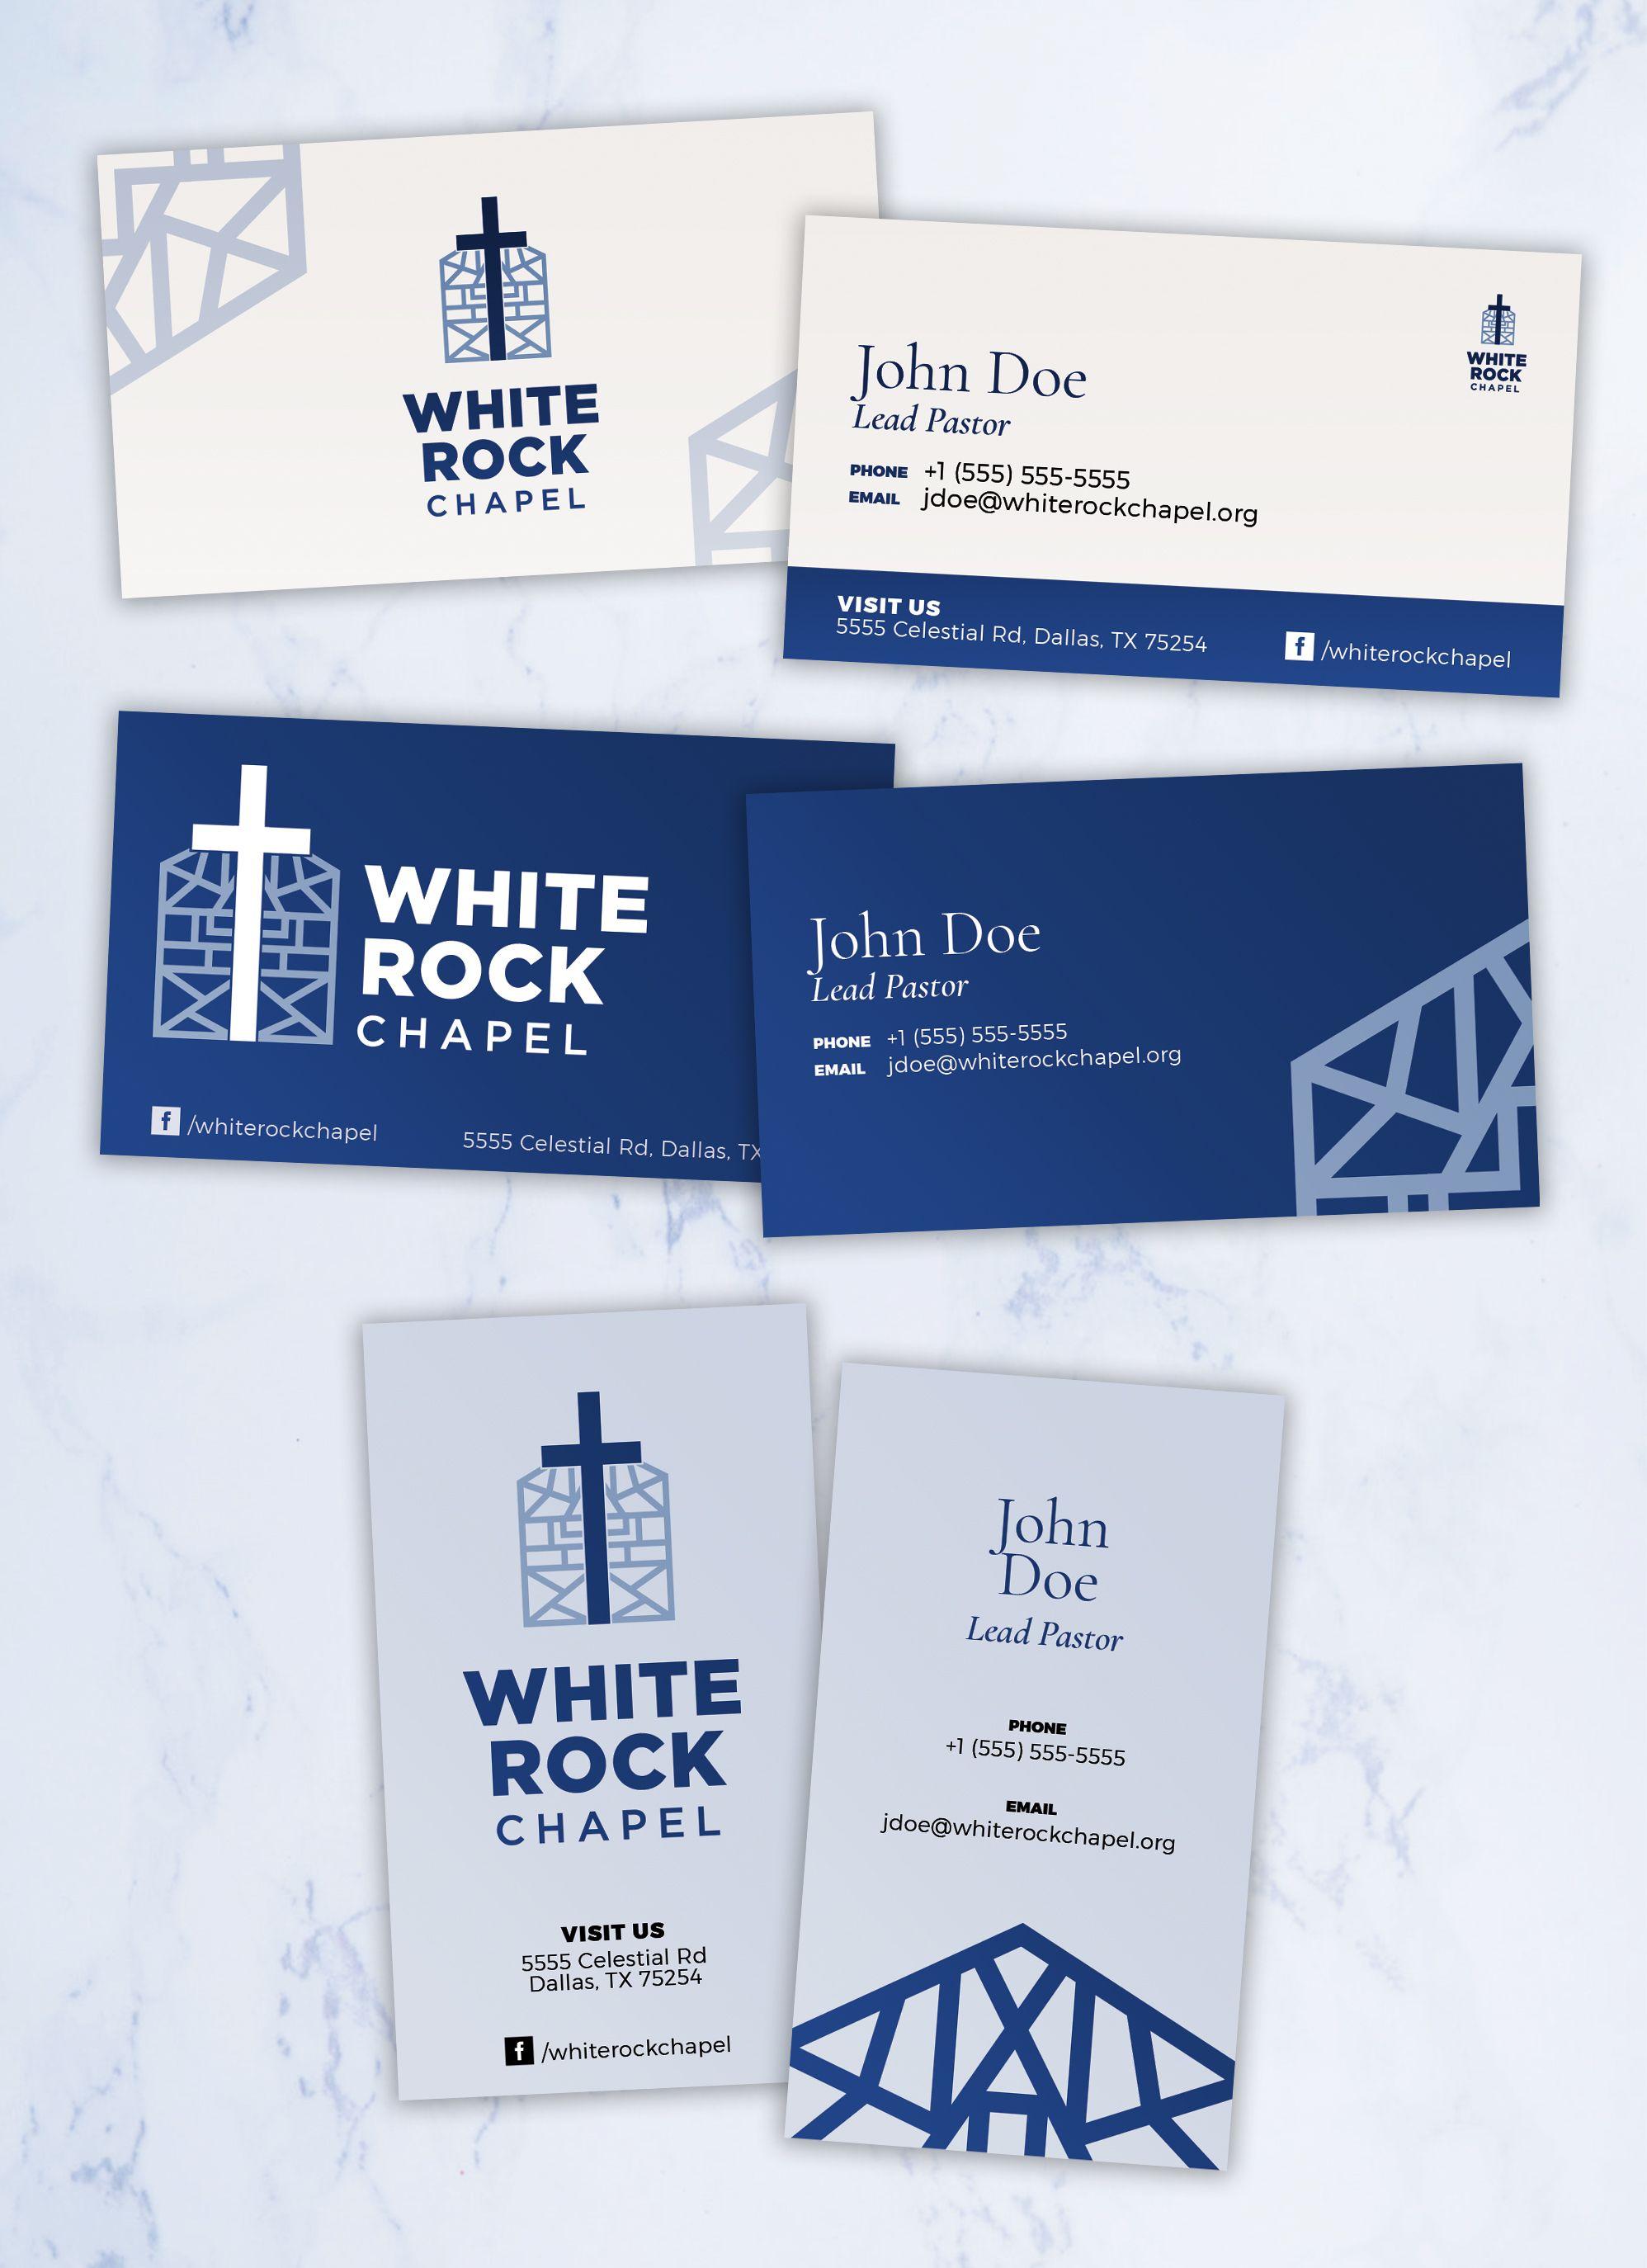 White Rock Chapel Business Card Options Business Card Design Graphic Design Programs Brand Identity Design